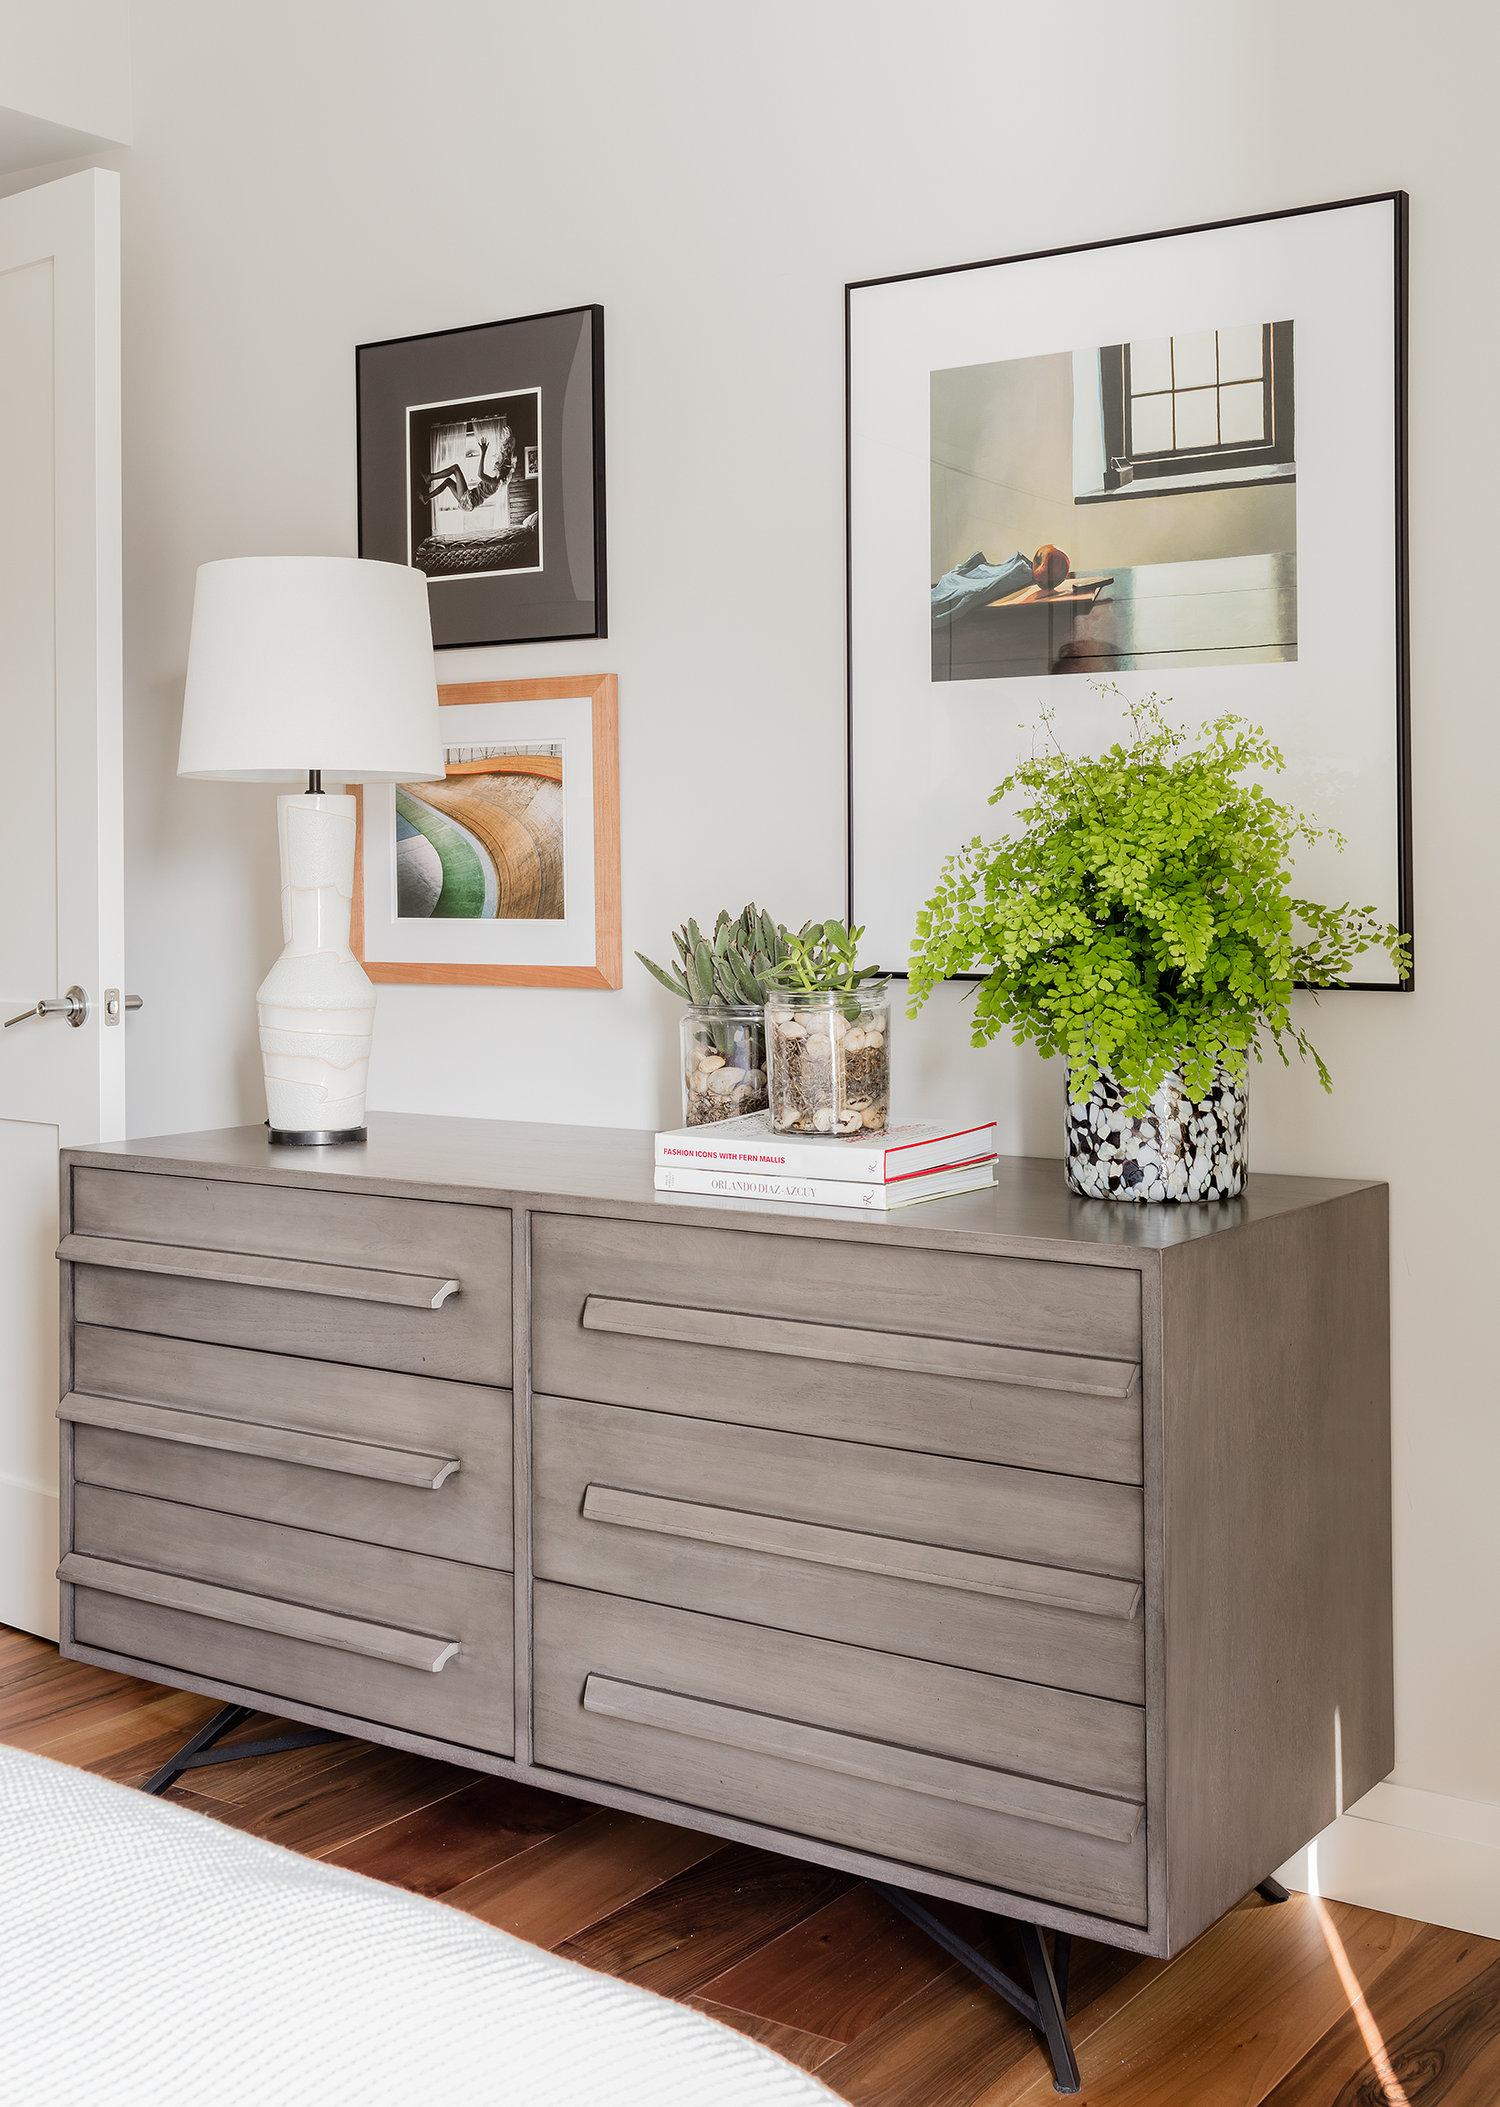 pier-4-model-guest-bed-dresser-hudson-interior-designs.jpg